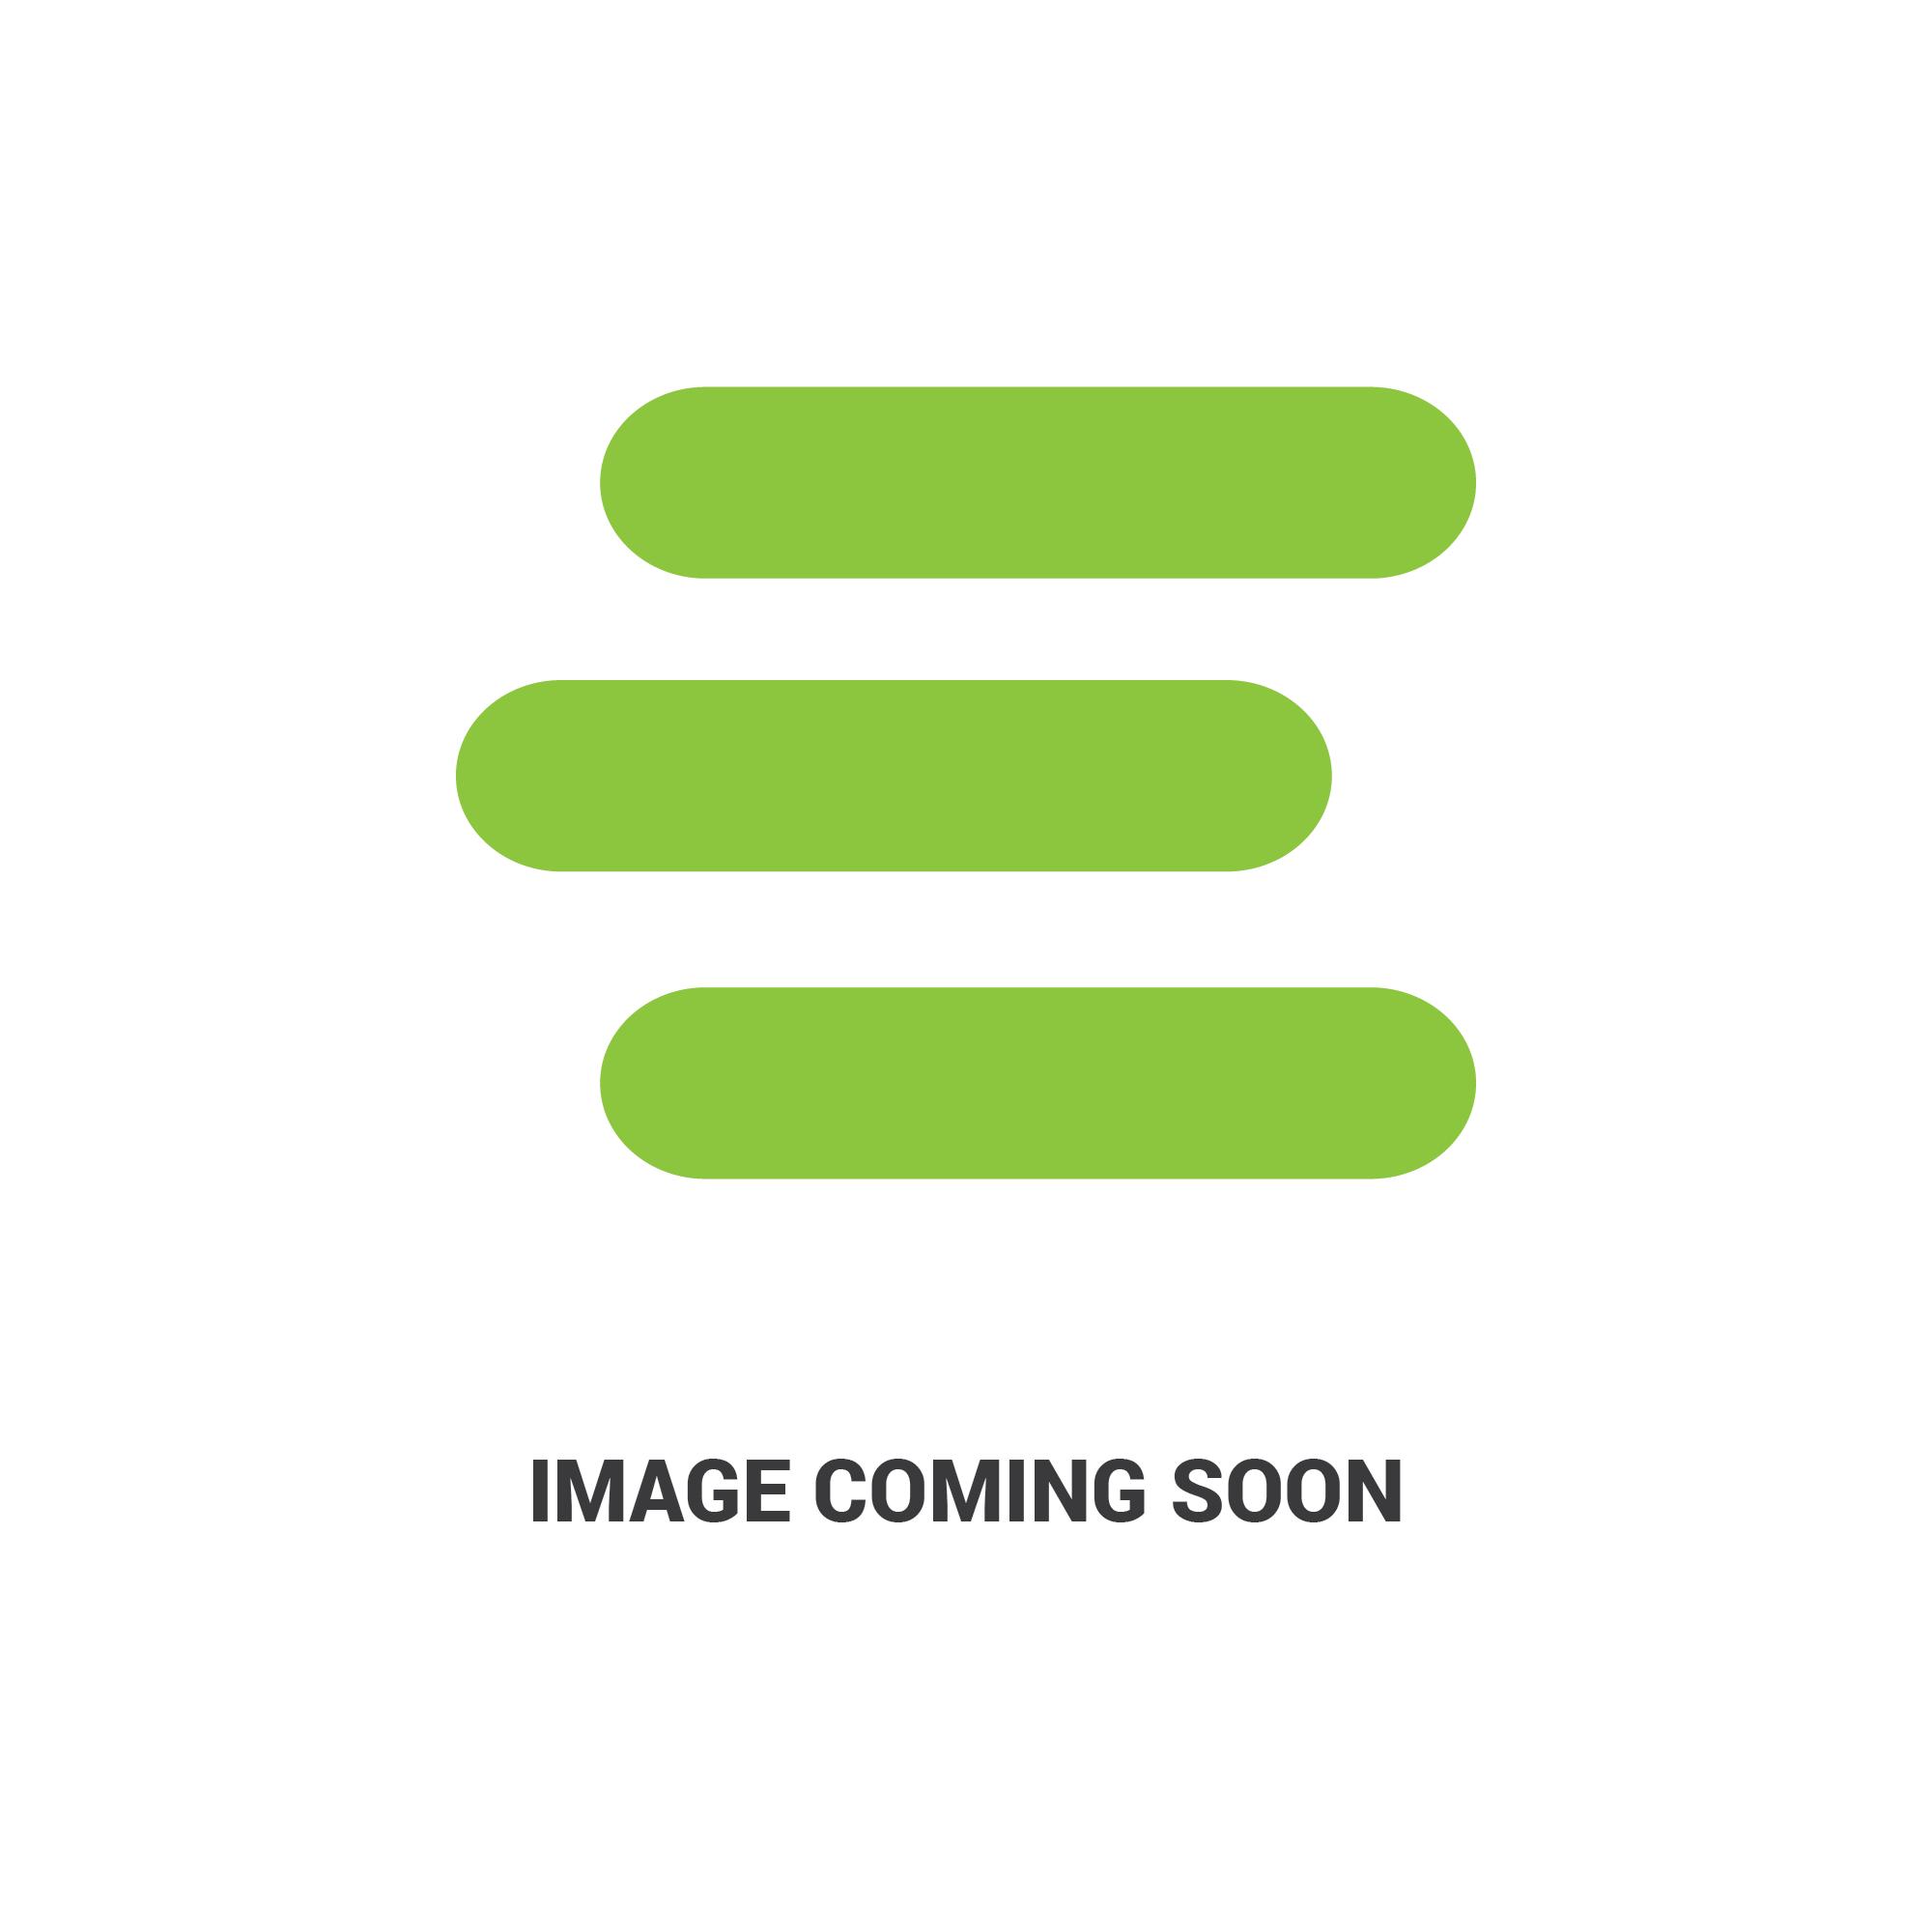 E-70000-16644653_1.jpg